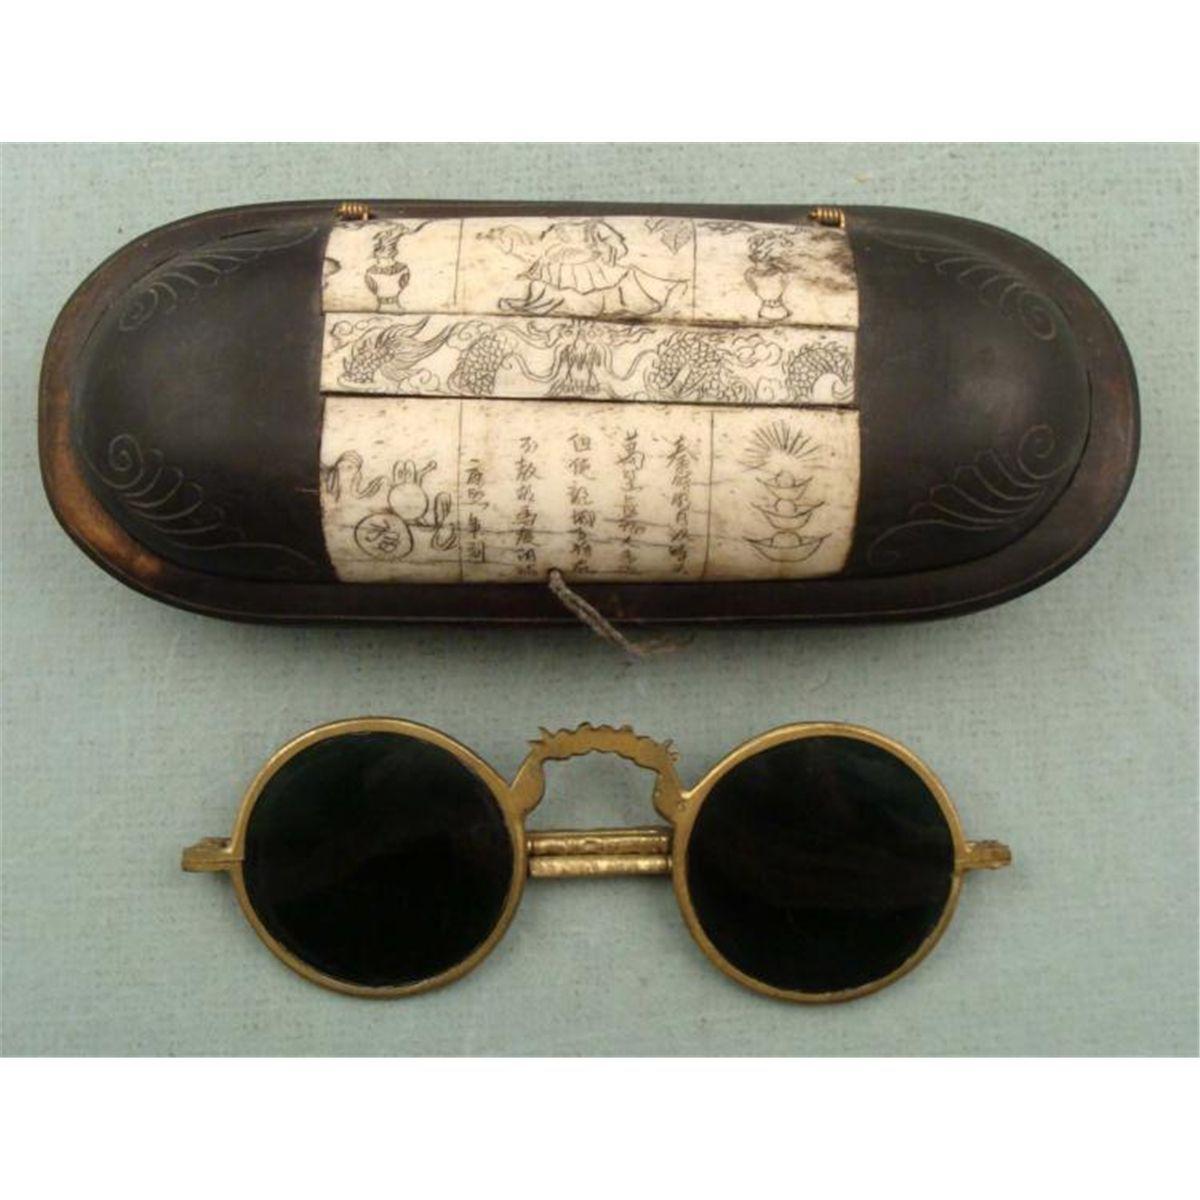 Vintage Chinese Glasses Case w/ Folding Sunglasses